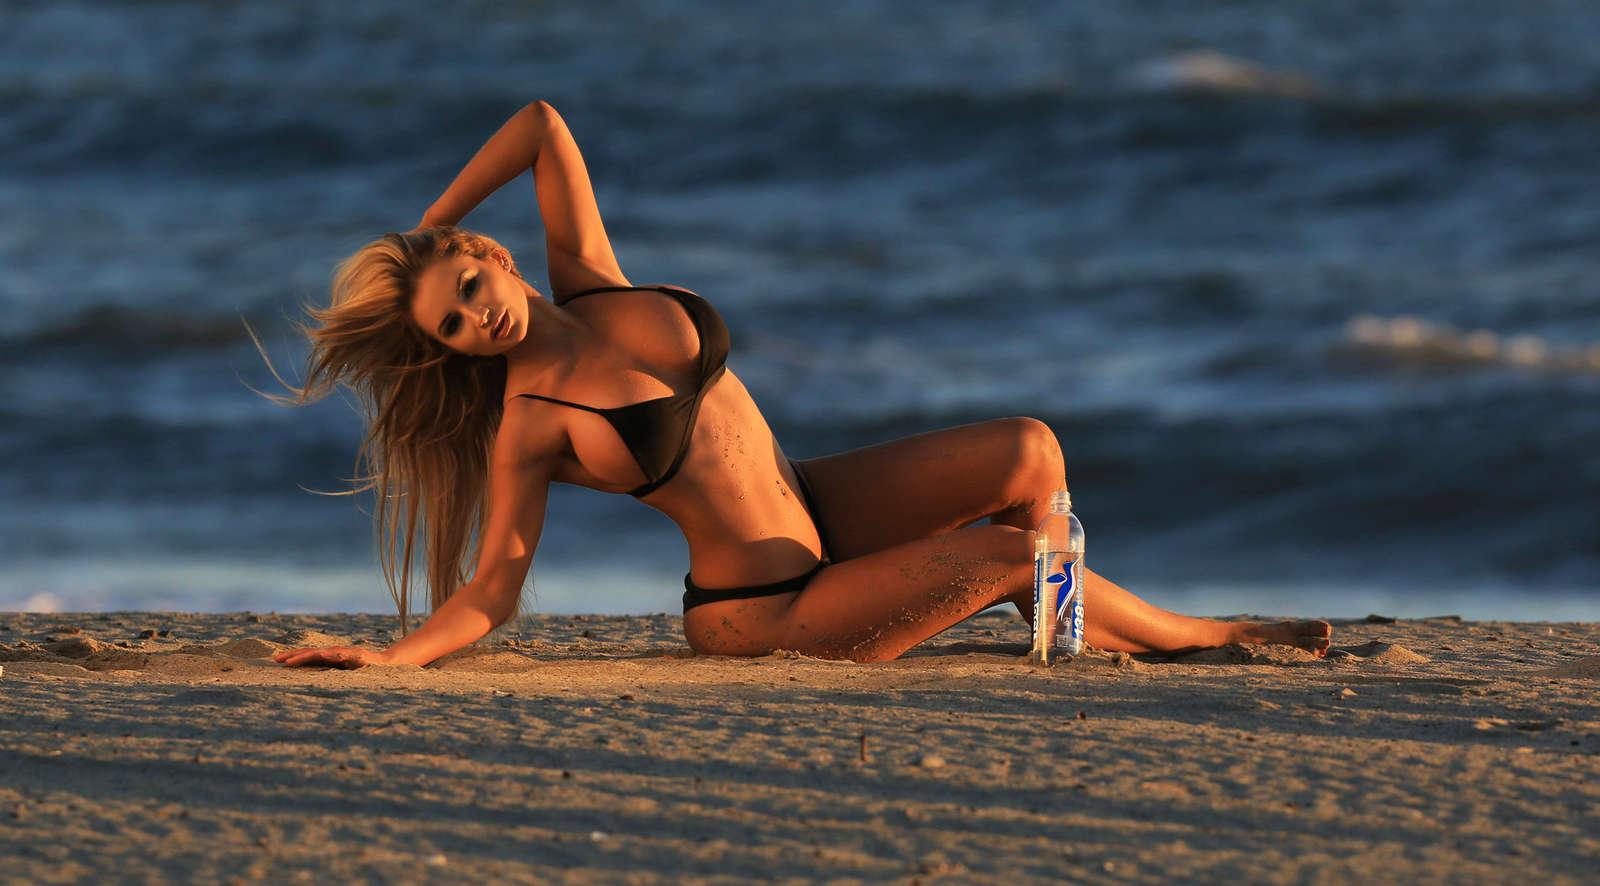 Amy-Lee-Summers--138-Water-Bikini--05